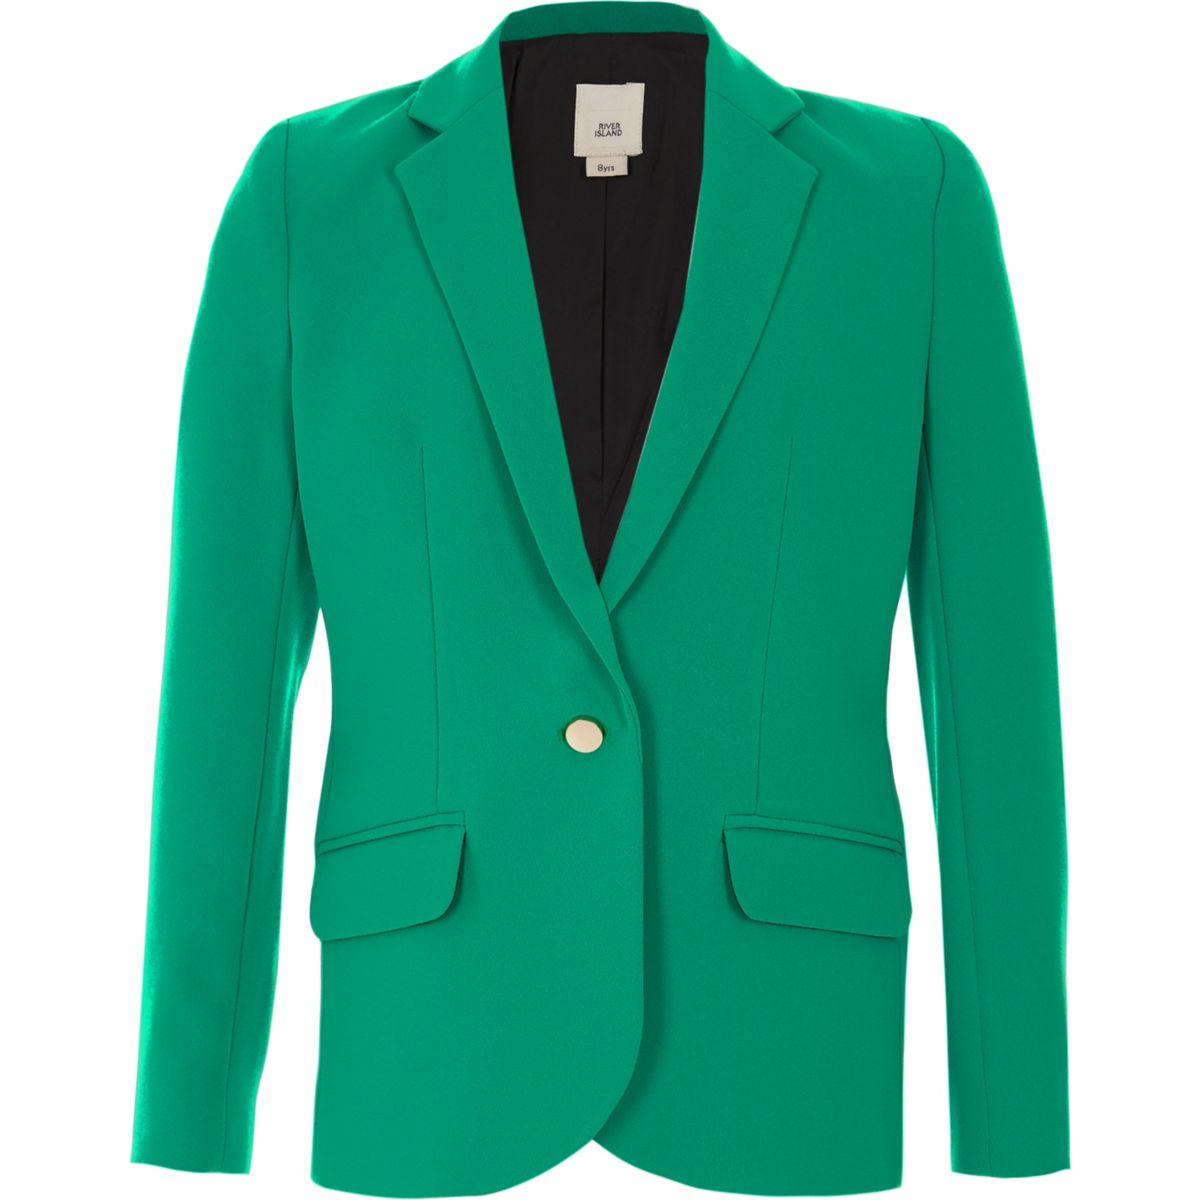 Girls green button-up blazer